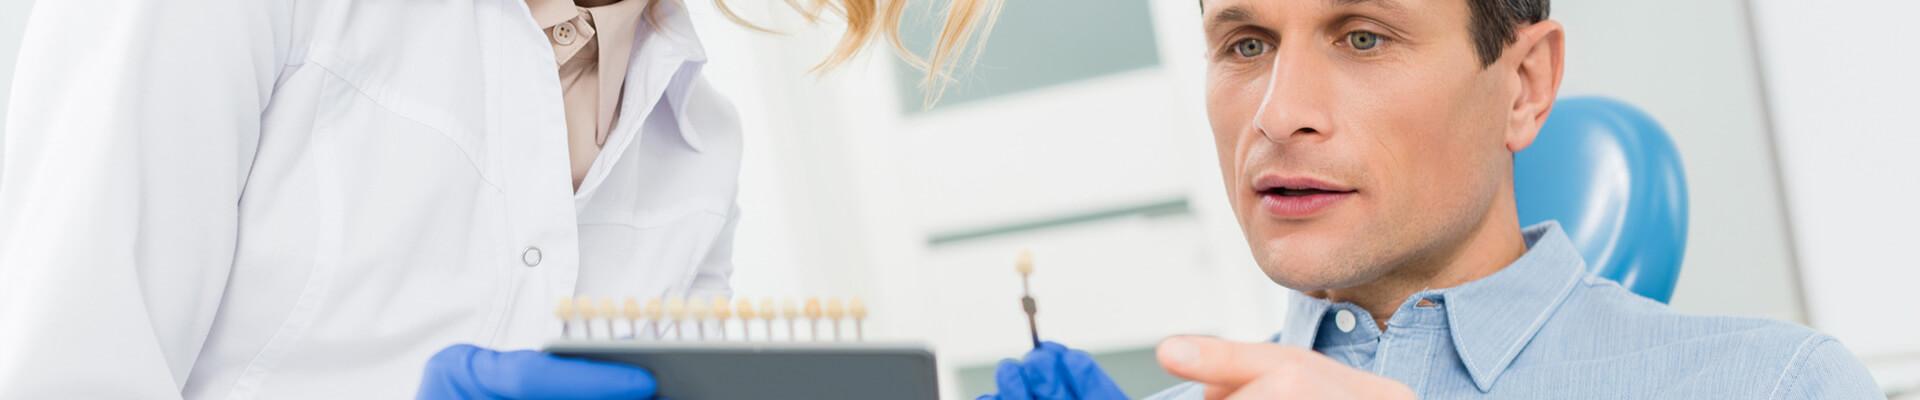 Patient examining dental prosthetic at dental clinic